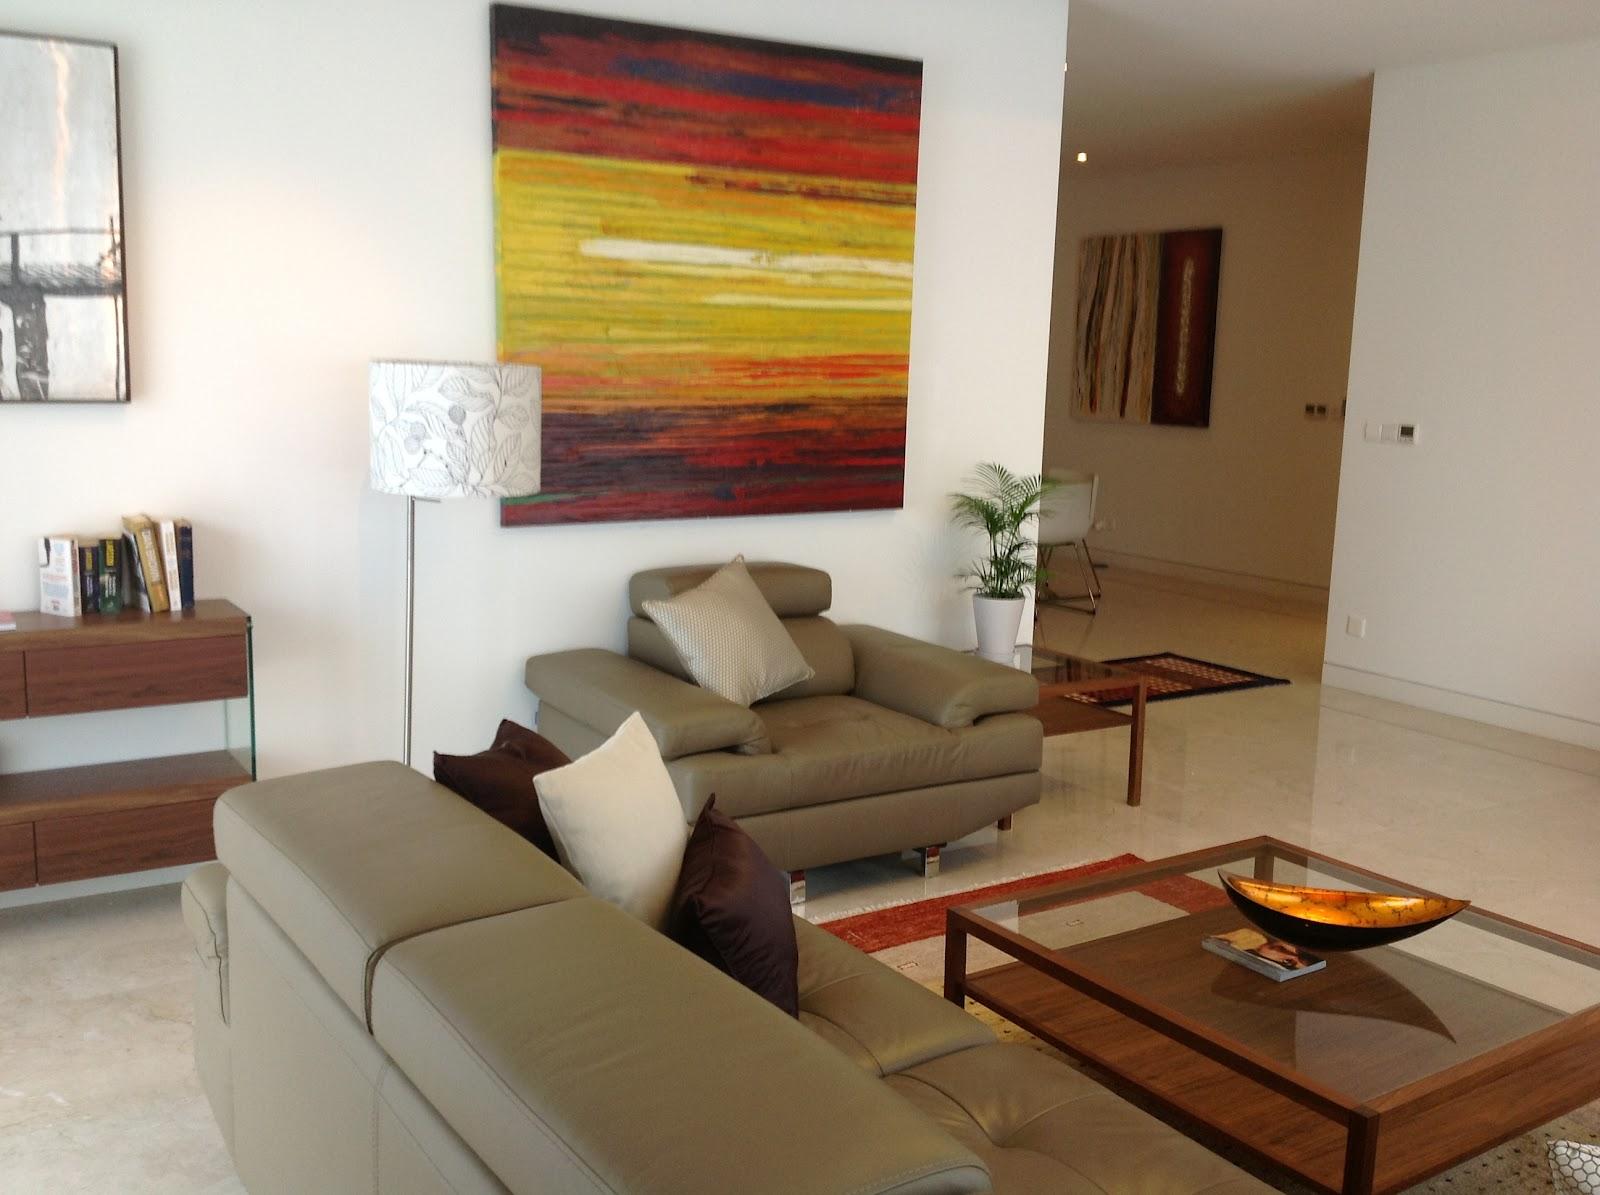 Five Star Serviced Apartment Rental At Pavilion Residence Kuala Lumpur